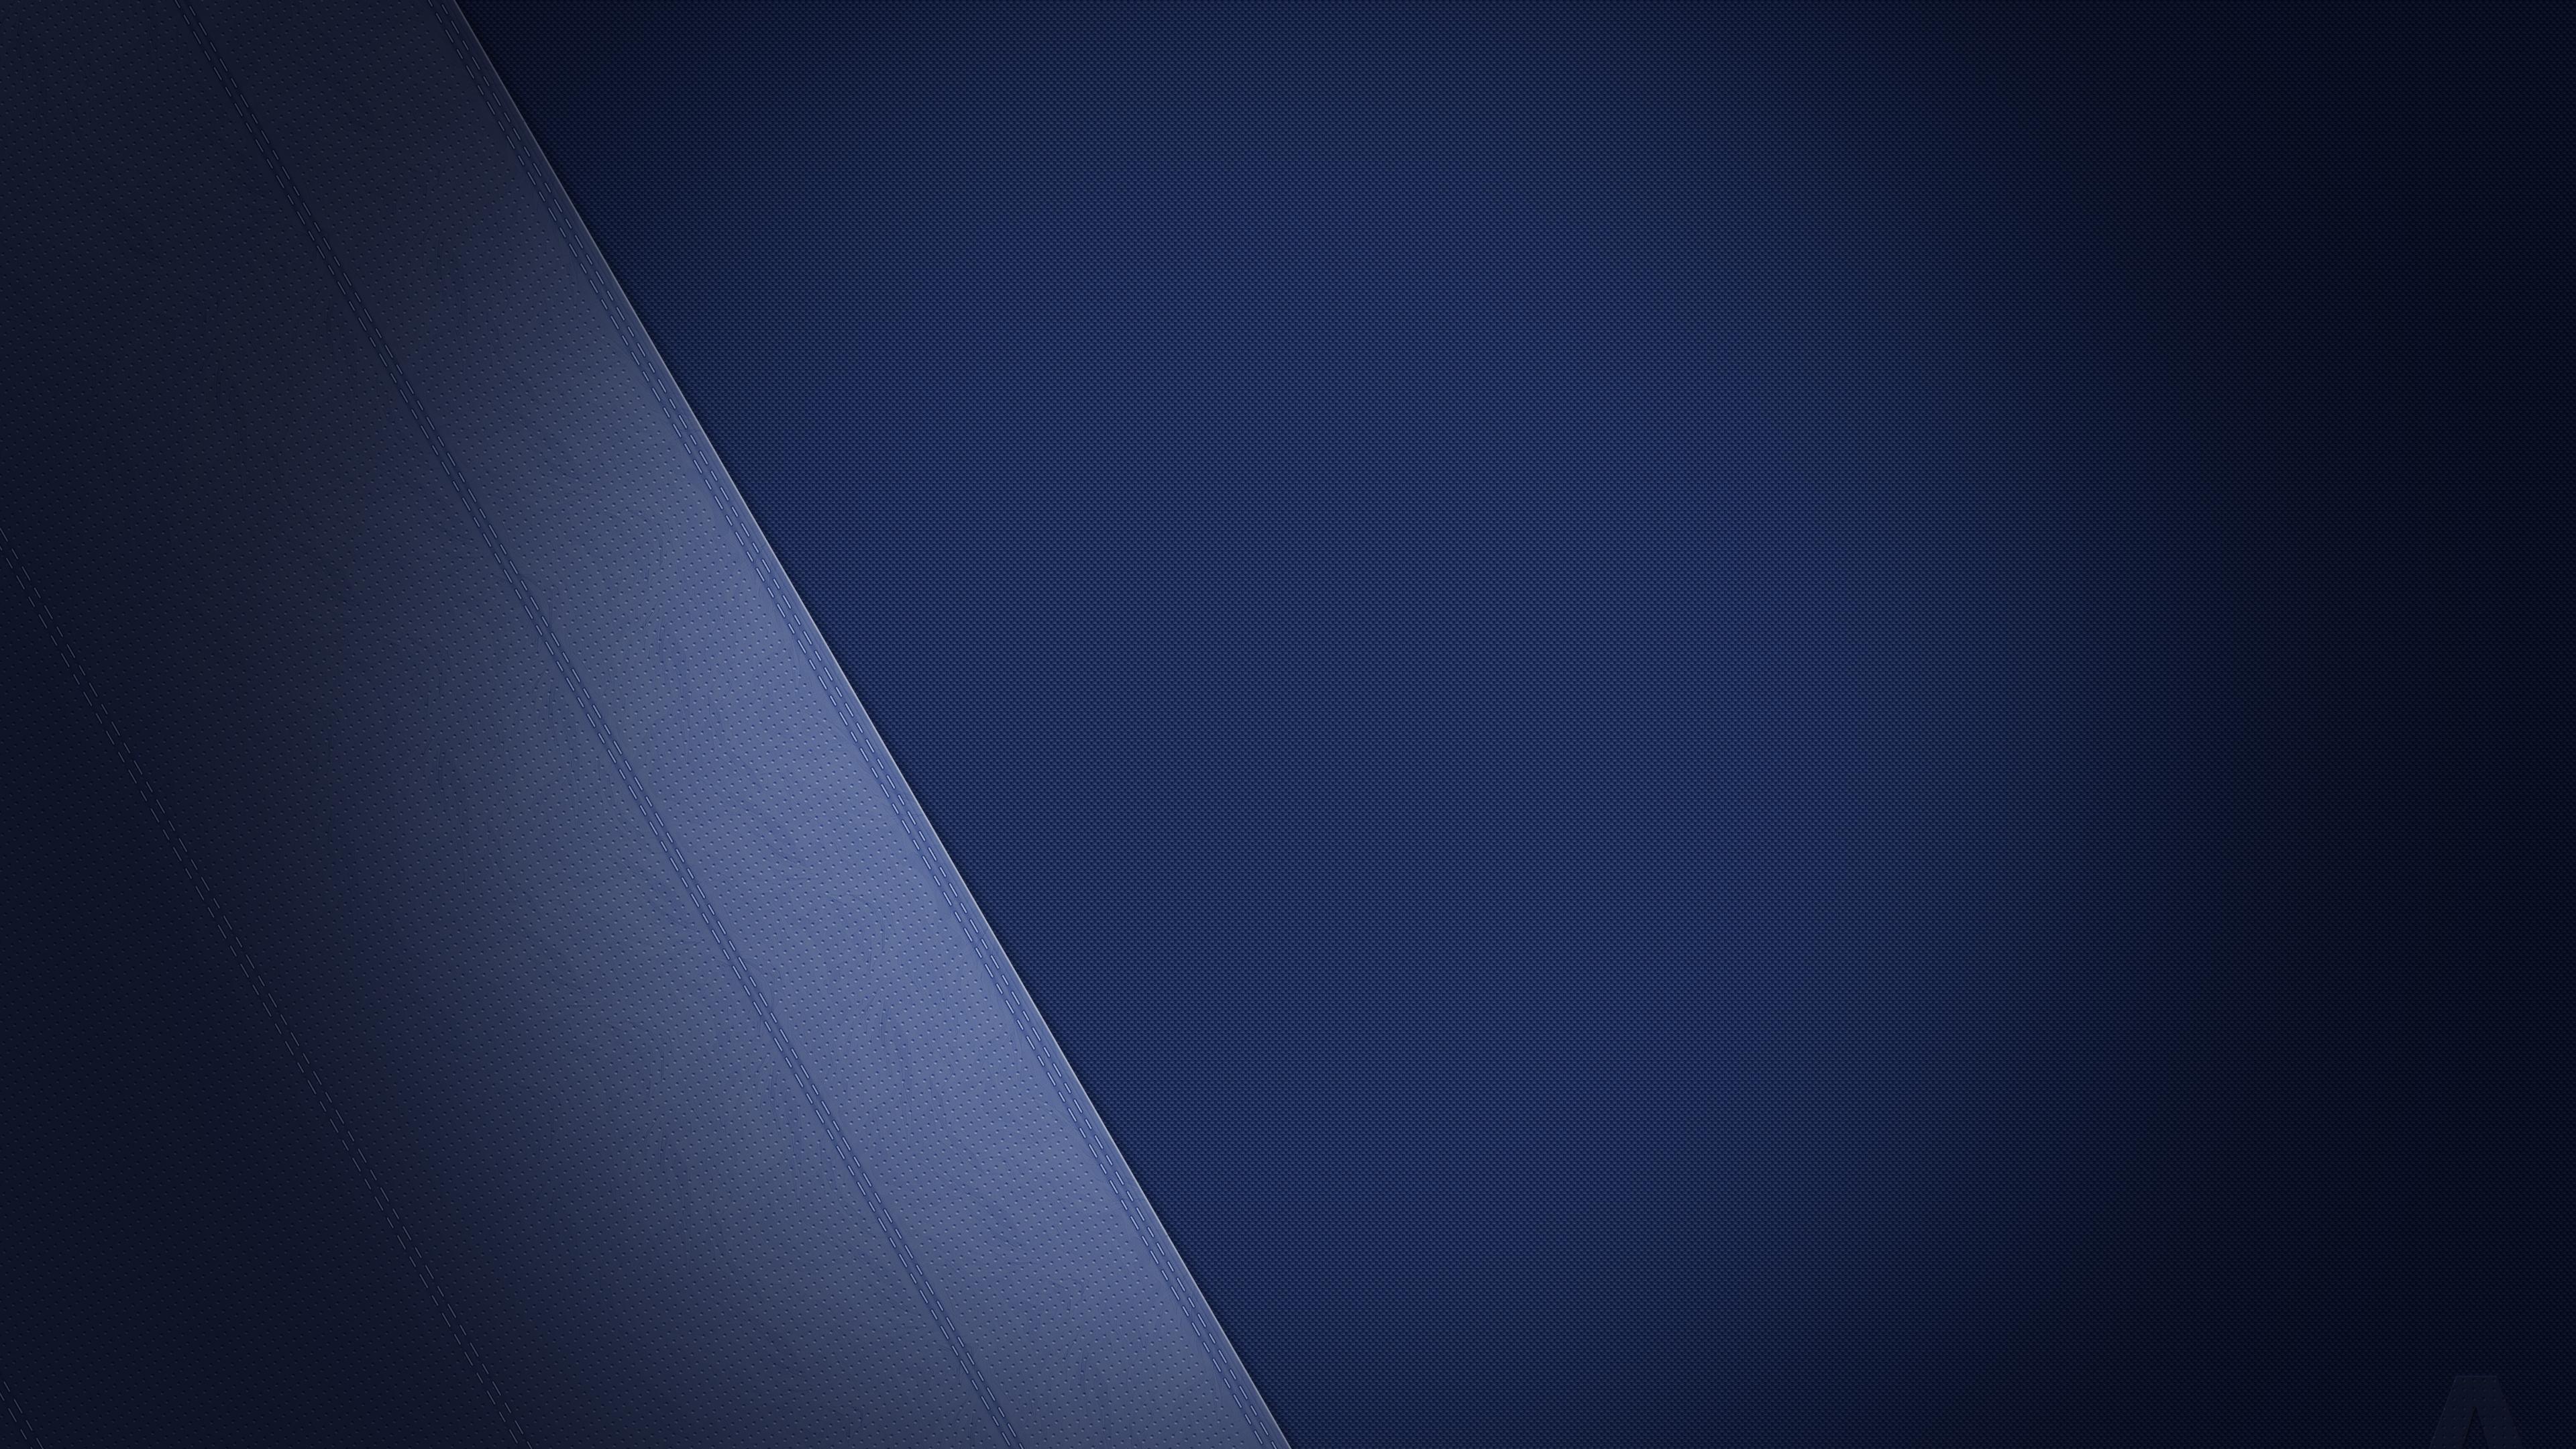 Leather Texture Blue 4k